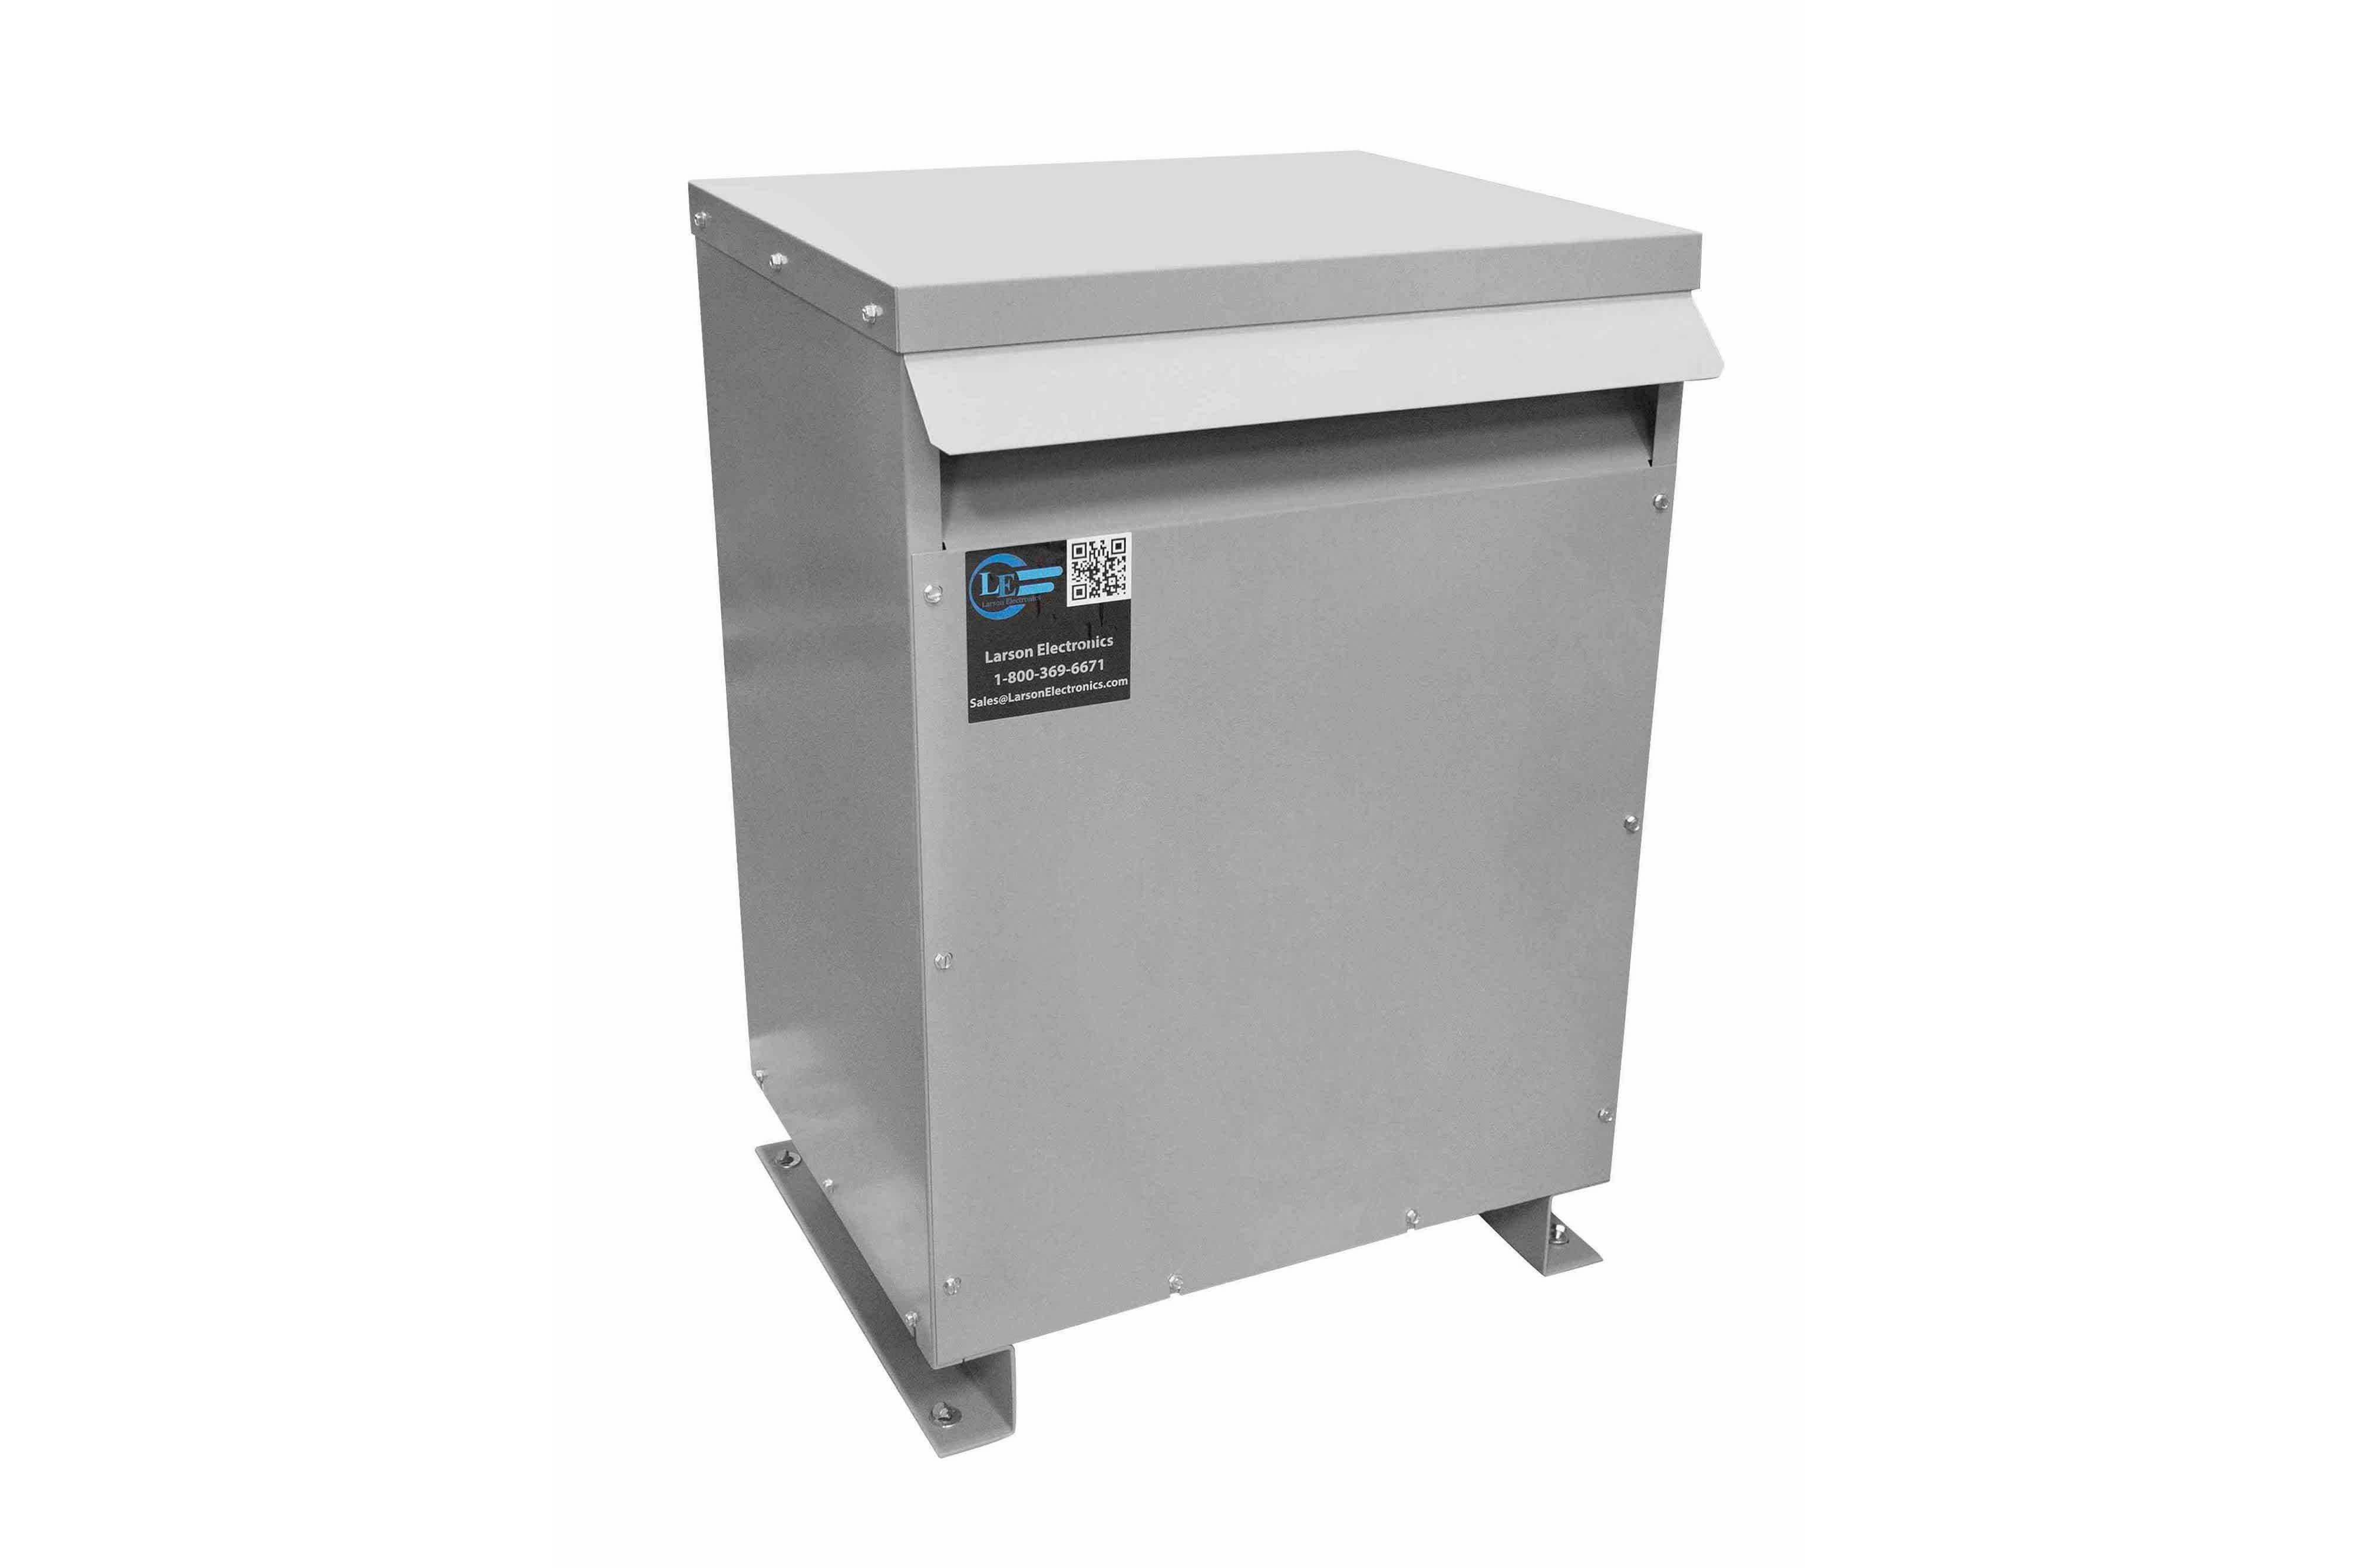 25 kVA 3PH Isolation Transformer, 575V Wye Primary, 415Y/240 Wye-N Secondary, N3R, Ventilated, 60 Hz